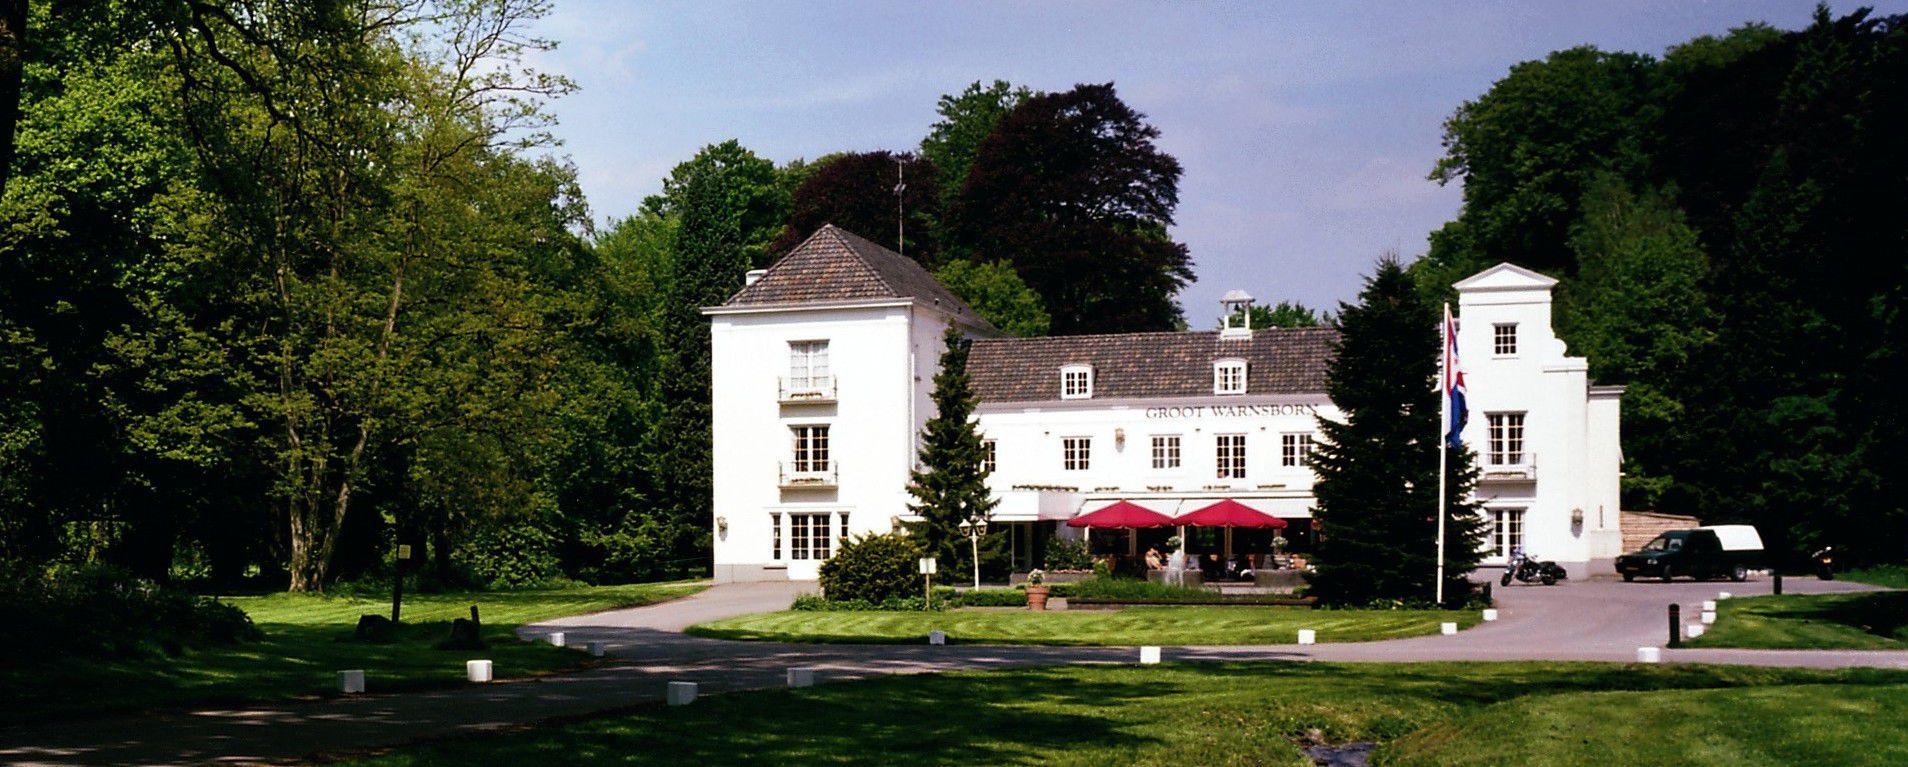 Luxe Hotel Arnhem | Landgoed Groot Wansborn